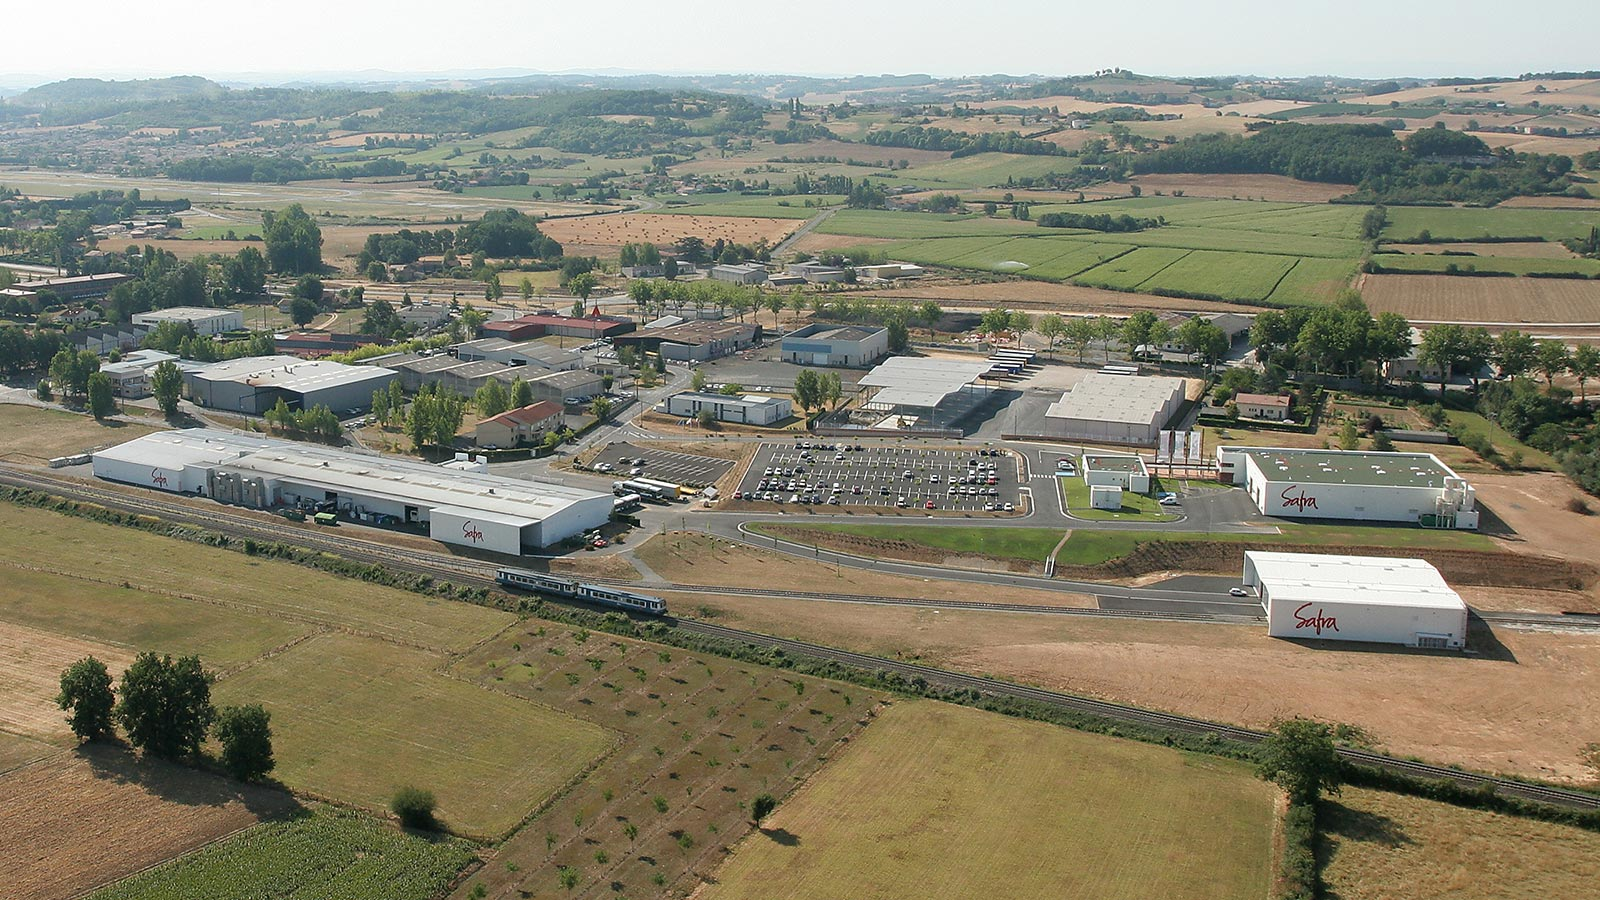 Safra new industrial site in Tarn